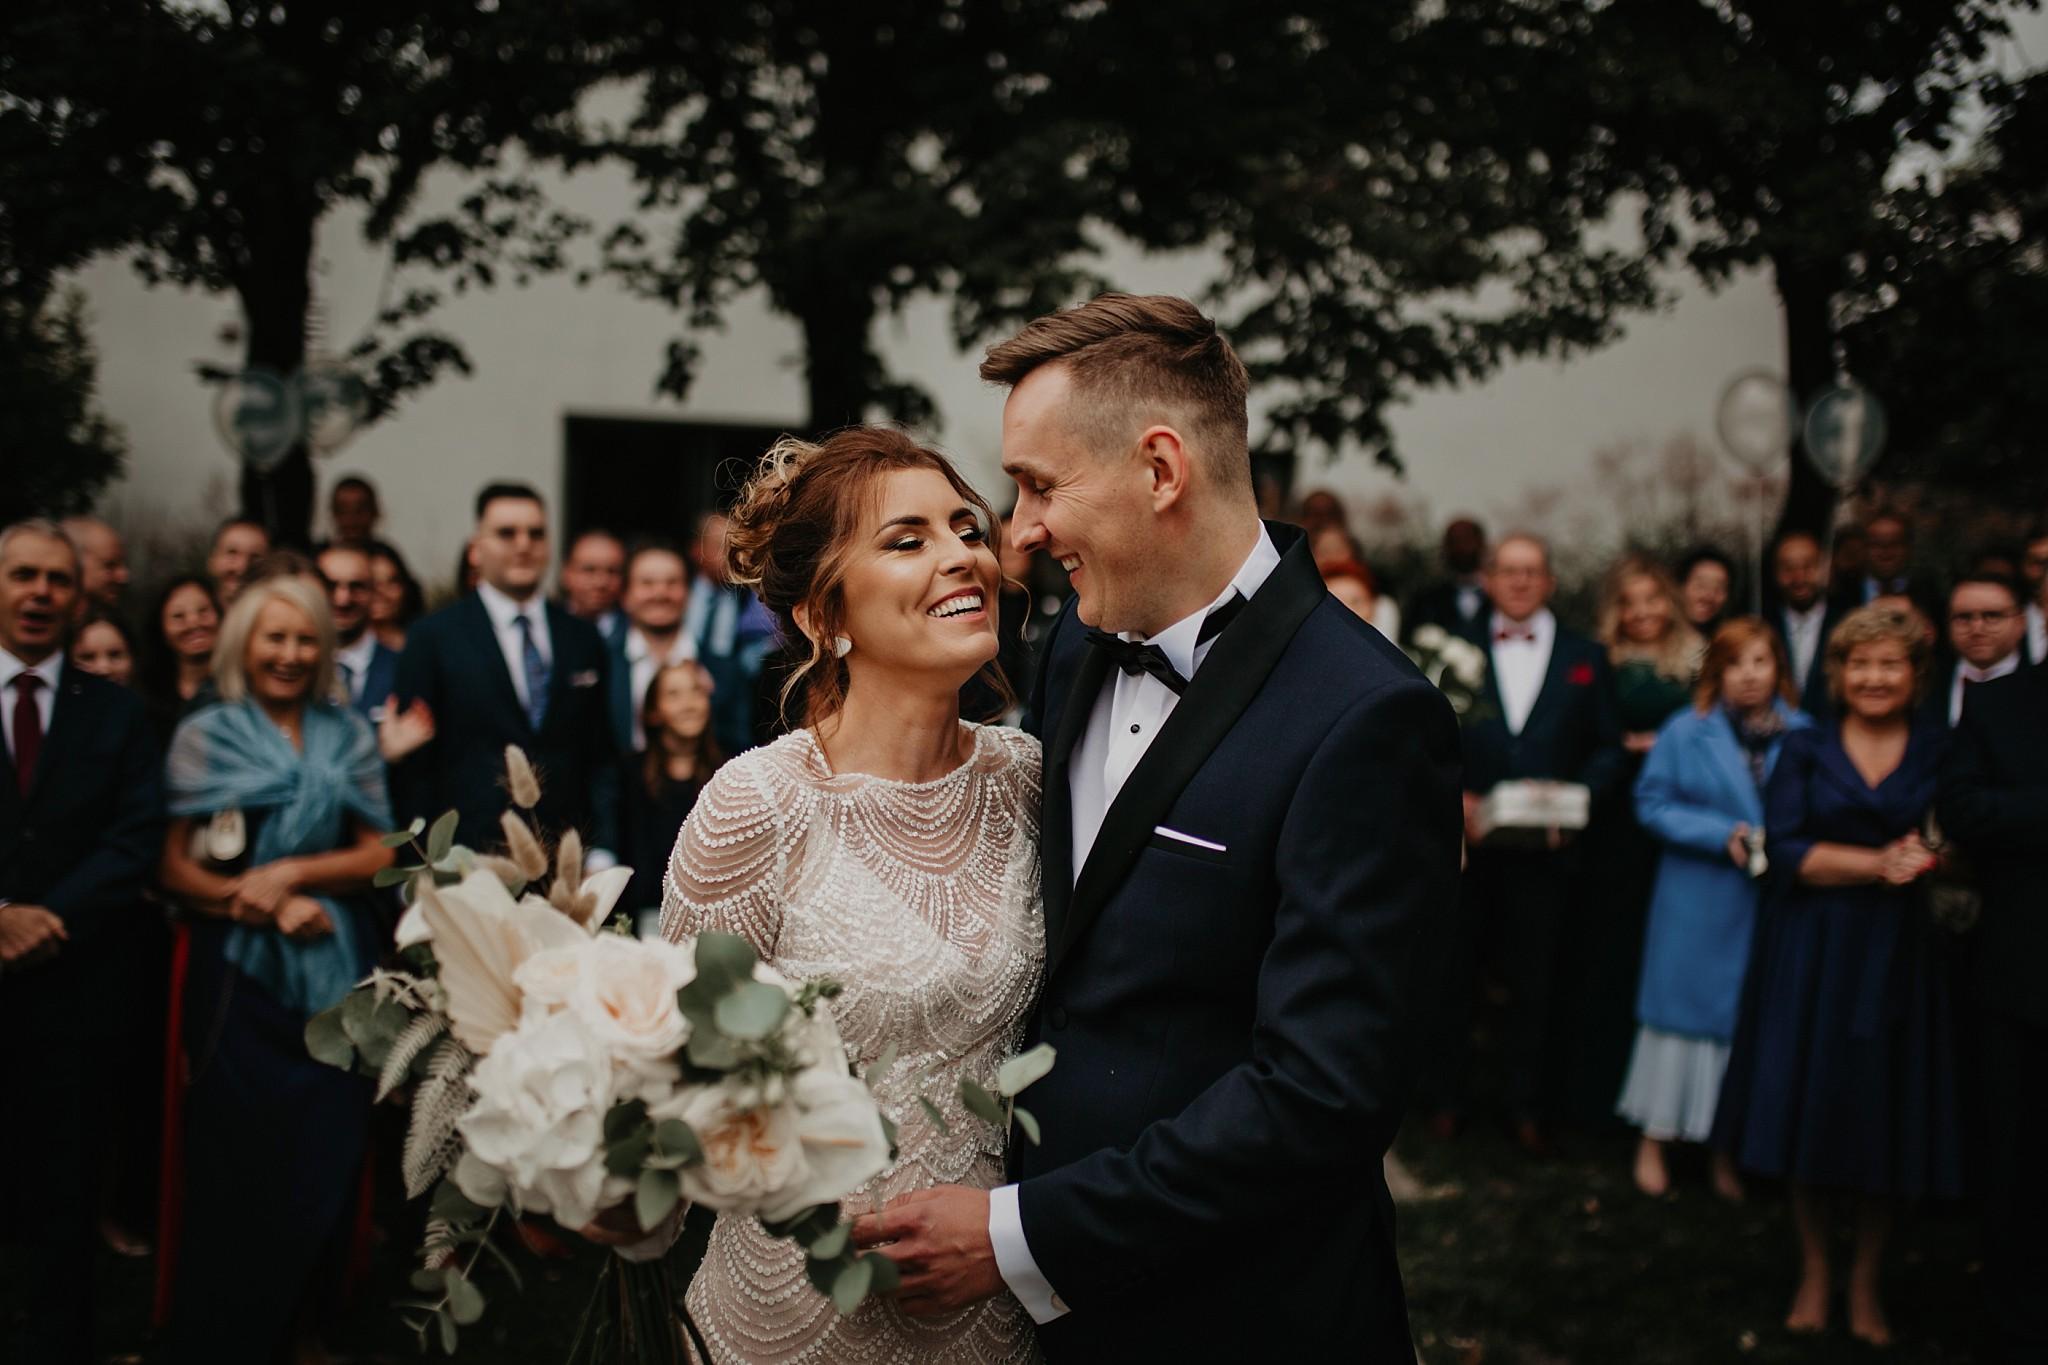 fotograf poznan wesele dobra truskawka piekne wesele pod poznaniem wesele w dobrej truskawce piekna para mloda slub marzen slub koronawirus slub listopad wesele koronawirus 263